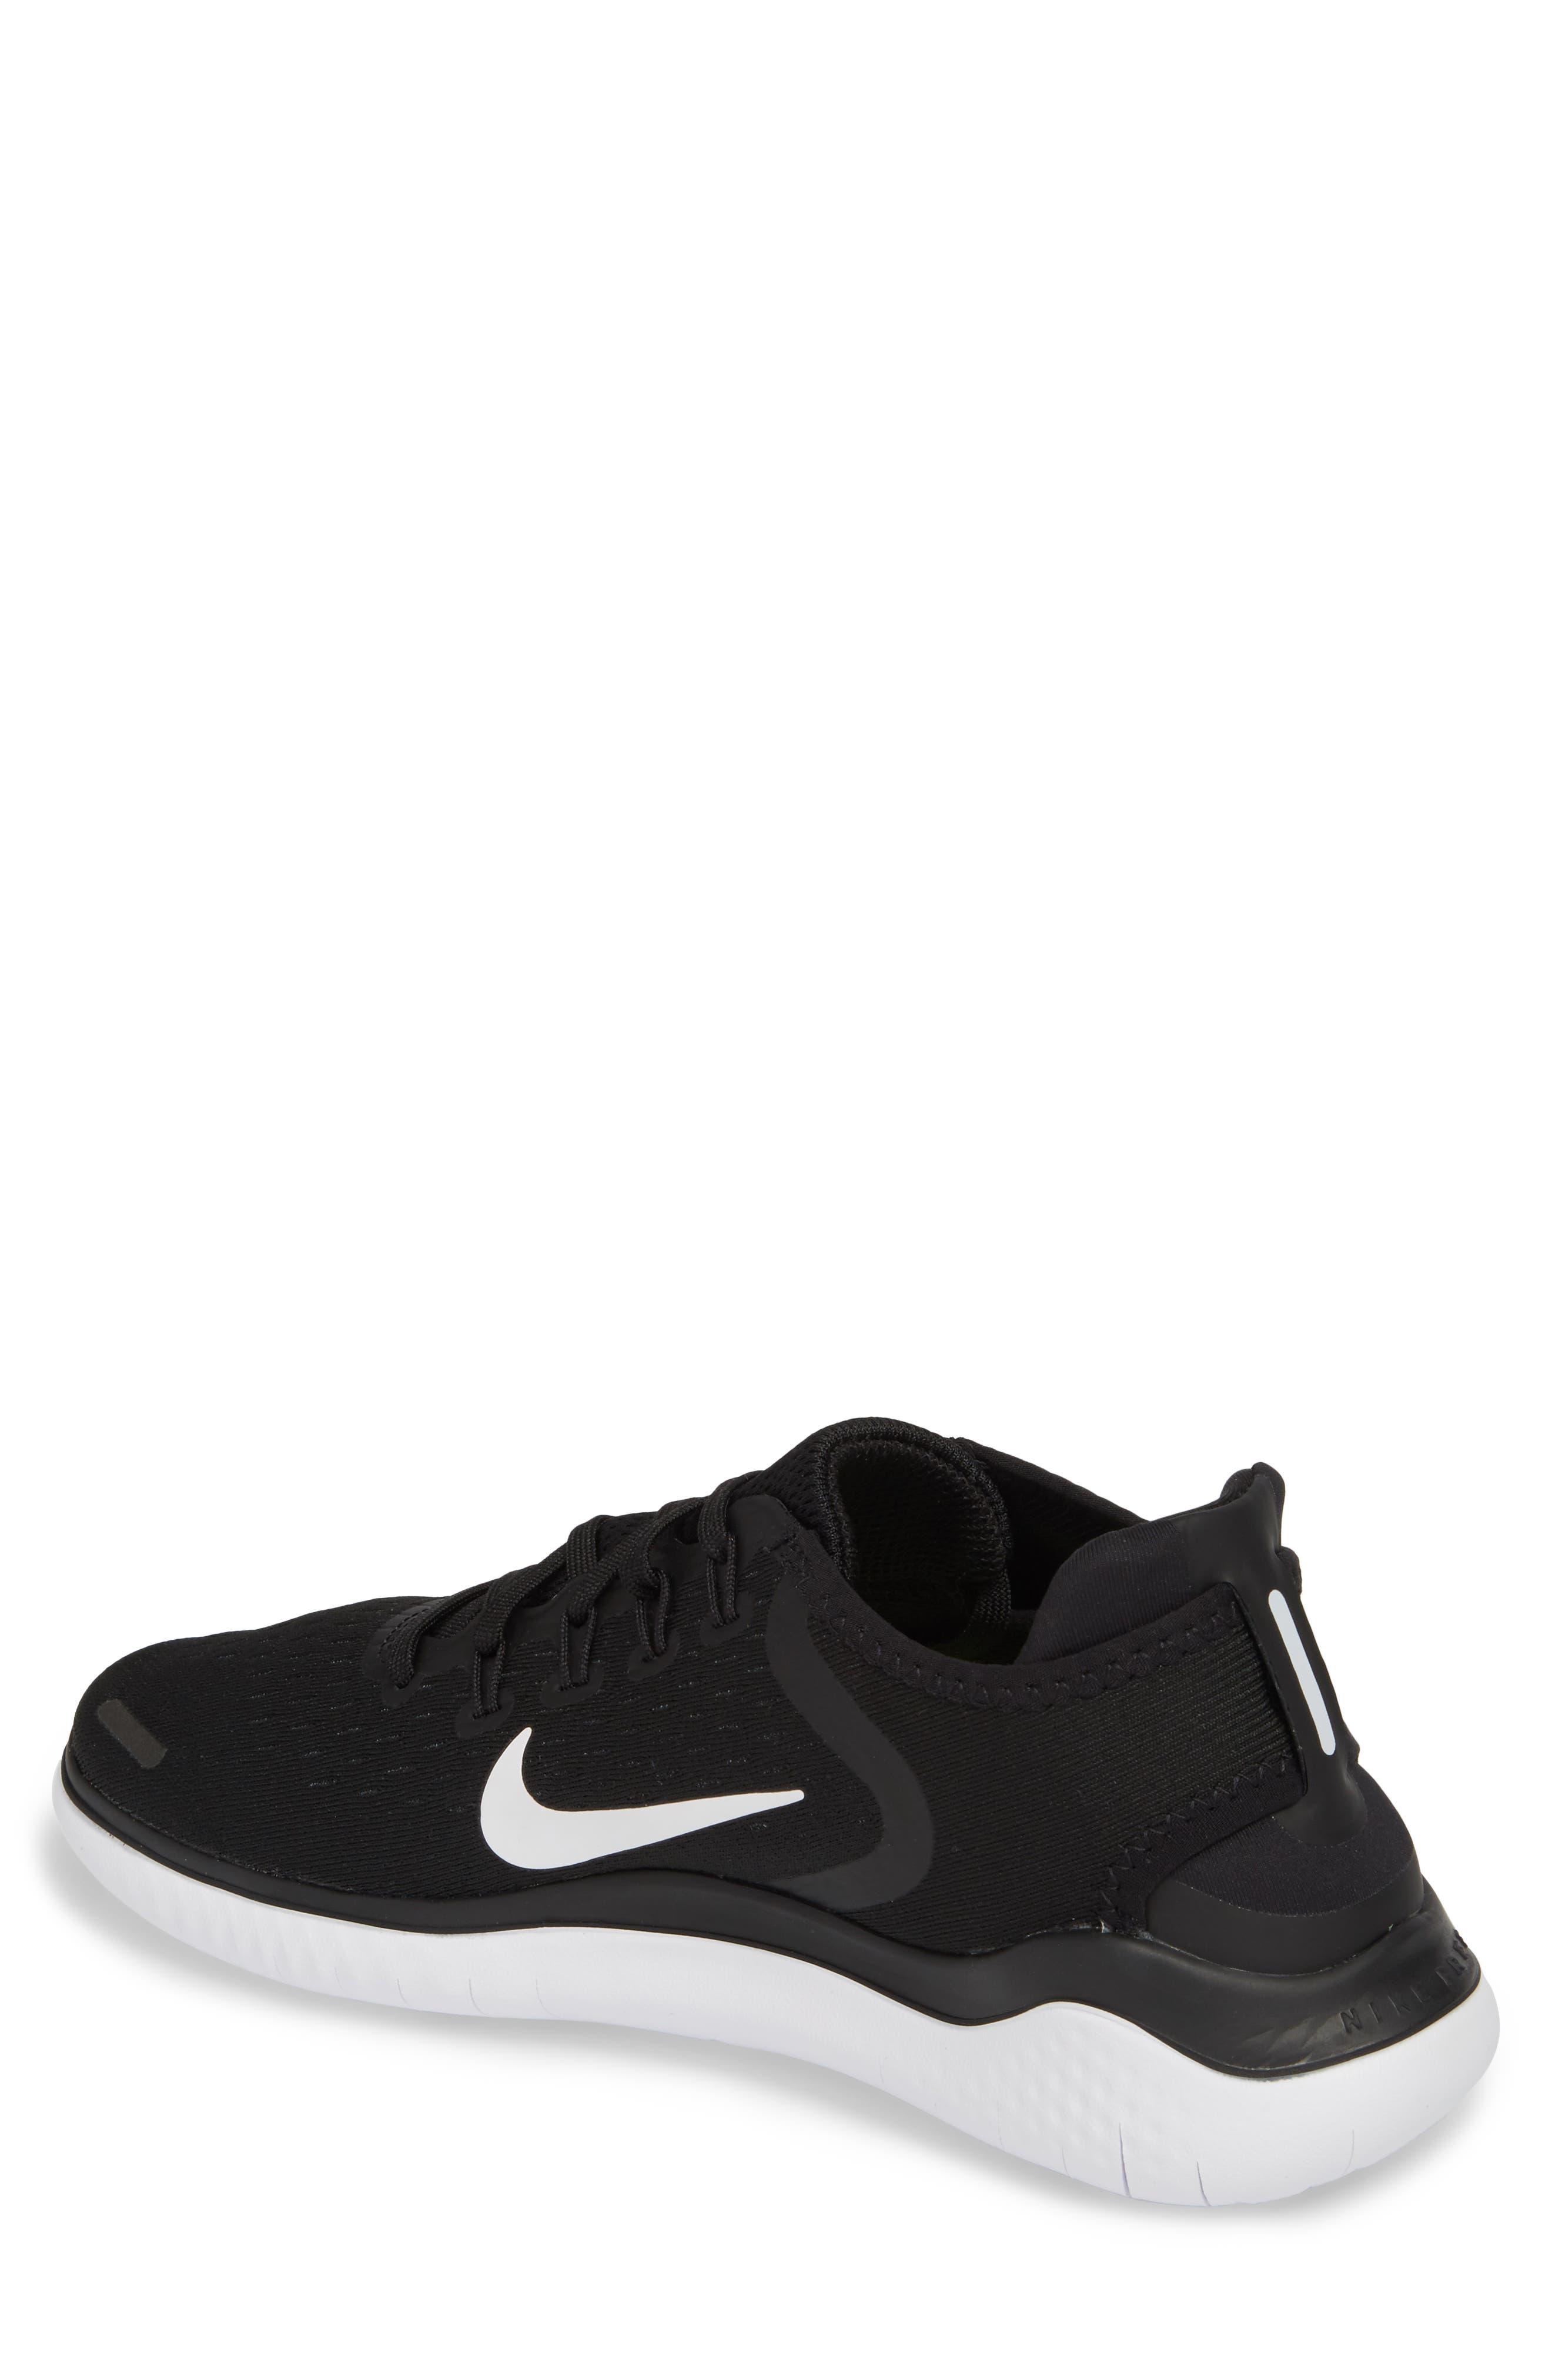 Free RN 2018 Running Shoe,                             Alternate thumbnail 2, color,                             BLACK/ WHITE